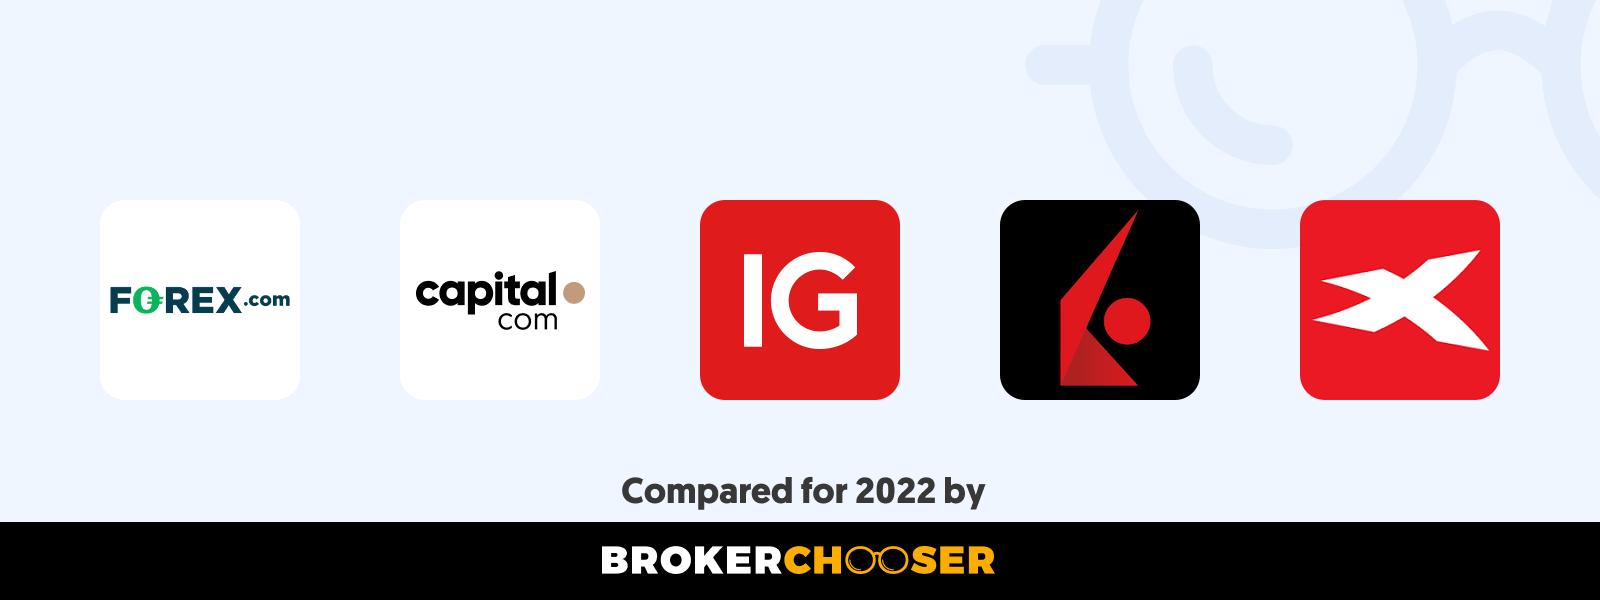 Best forex brokers for beginners in Greenland in 2021